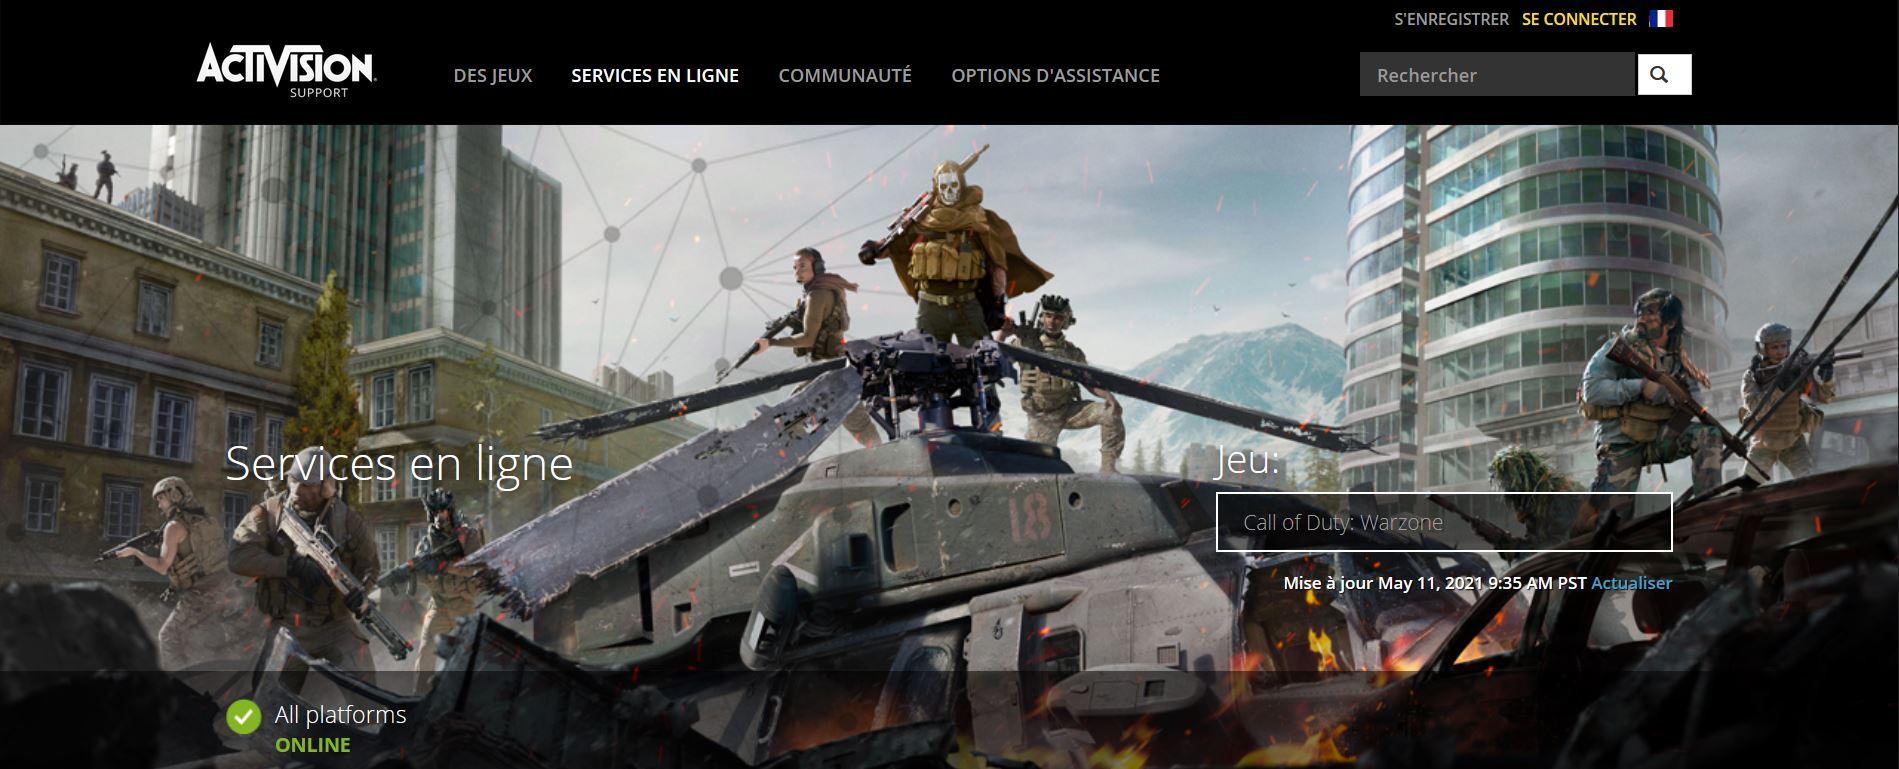 warzone-etat-serveurs-impossible-probleme-connexion-call-of-duty